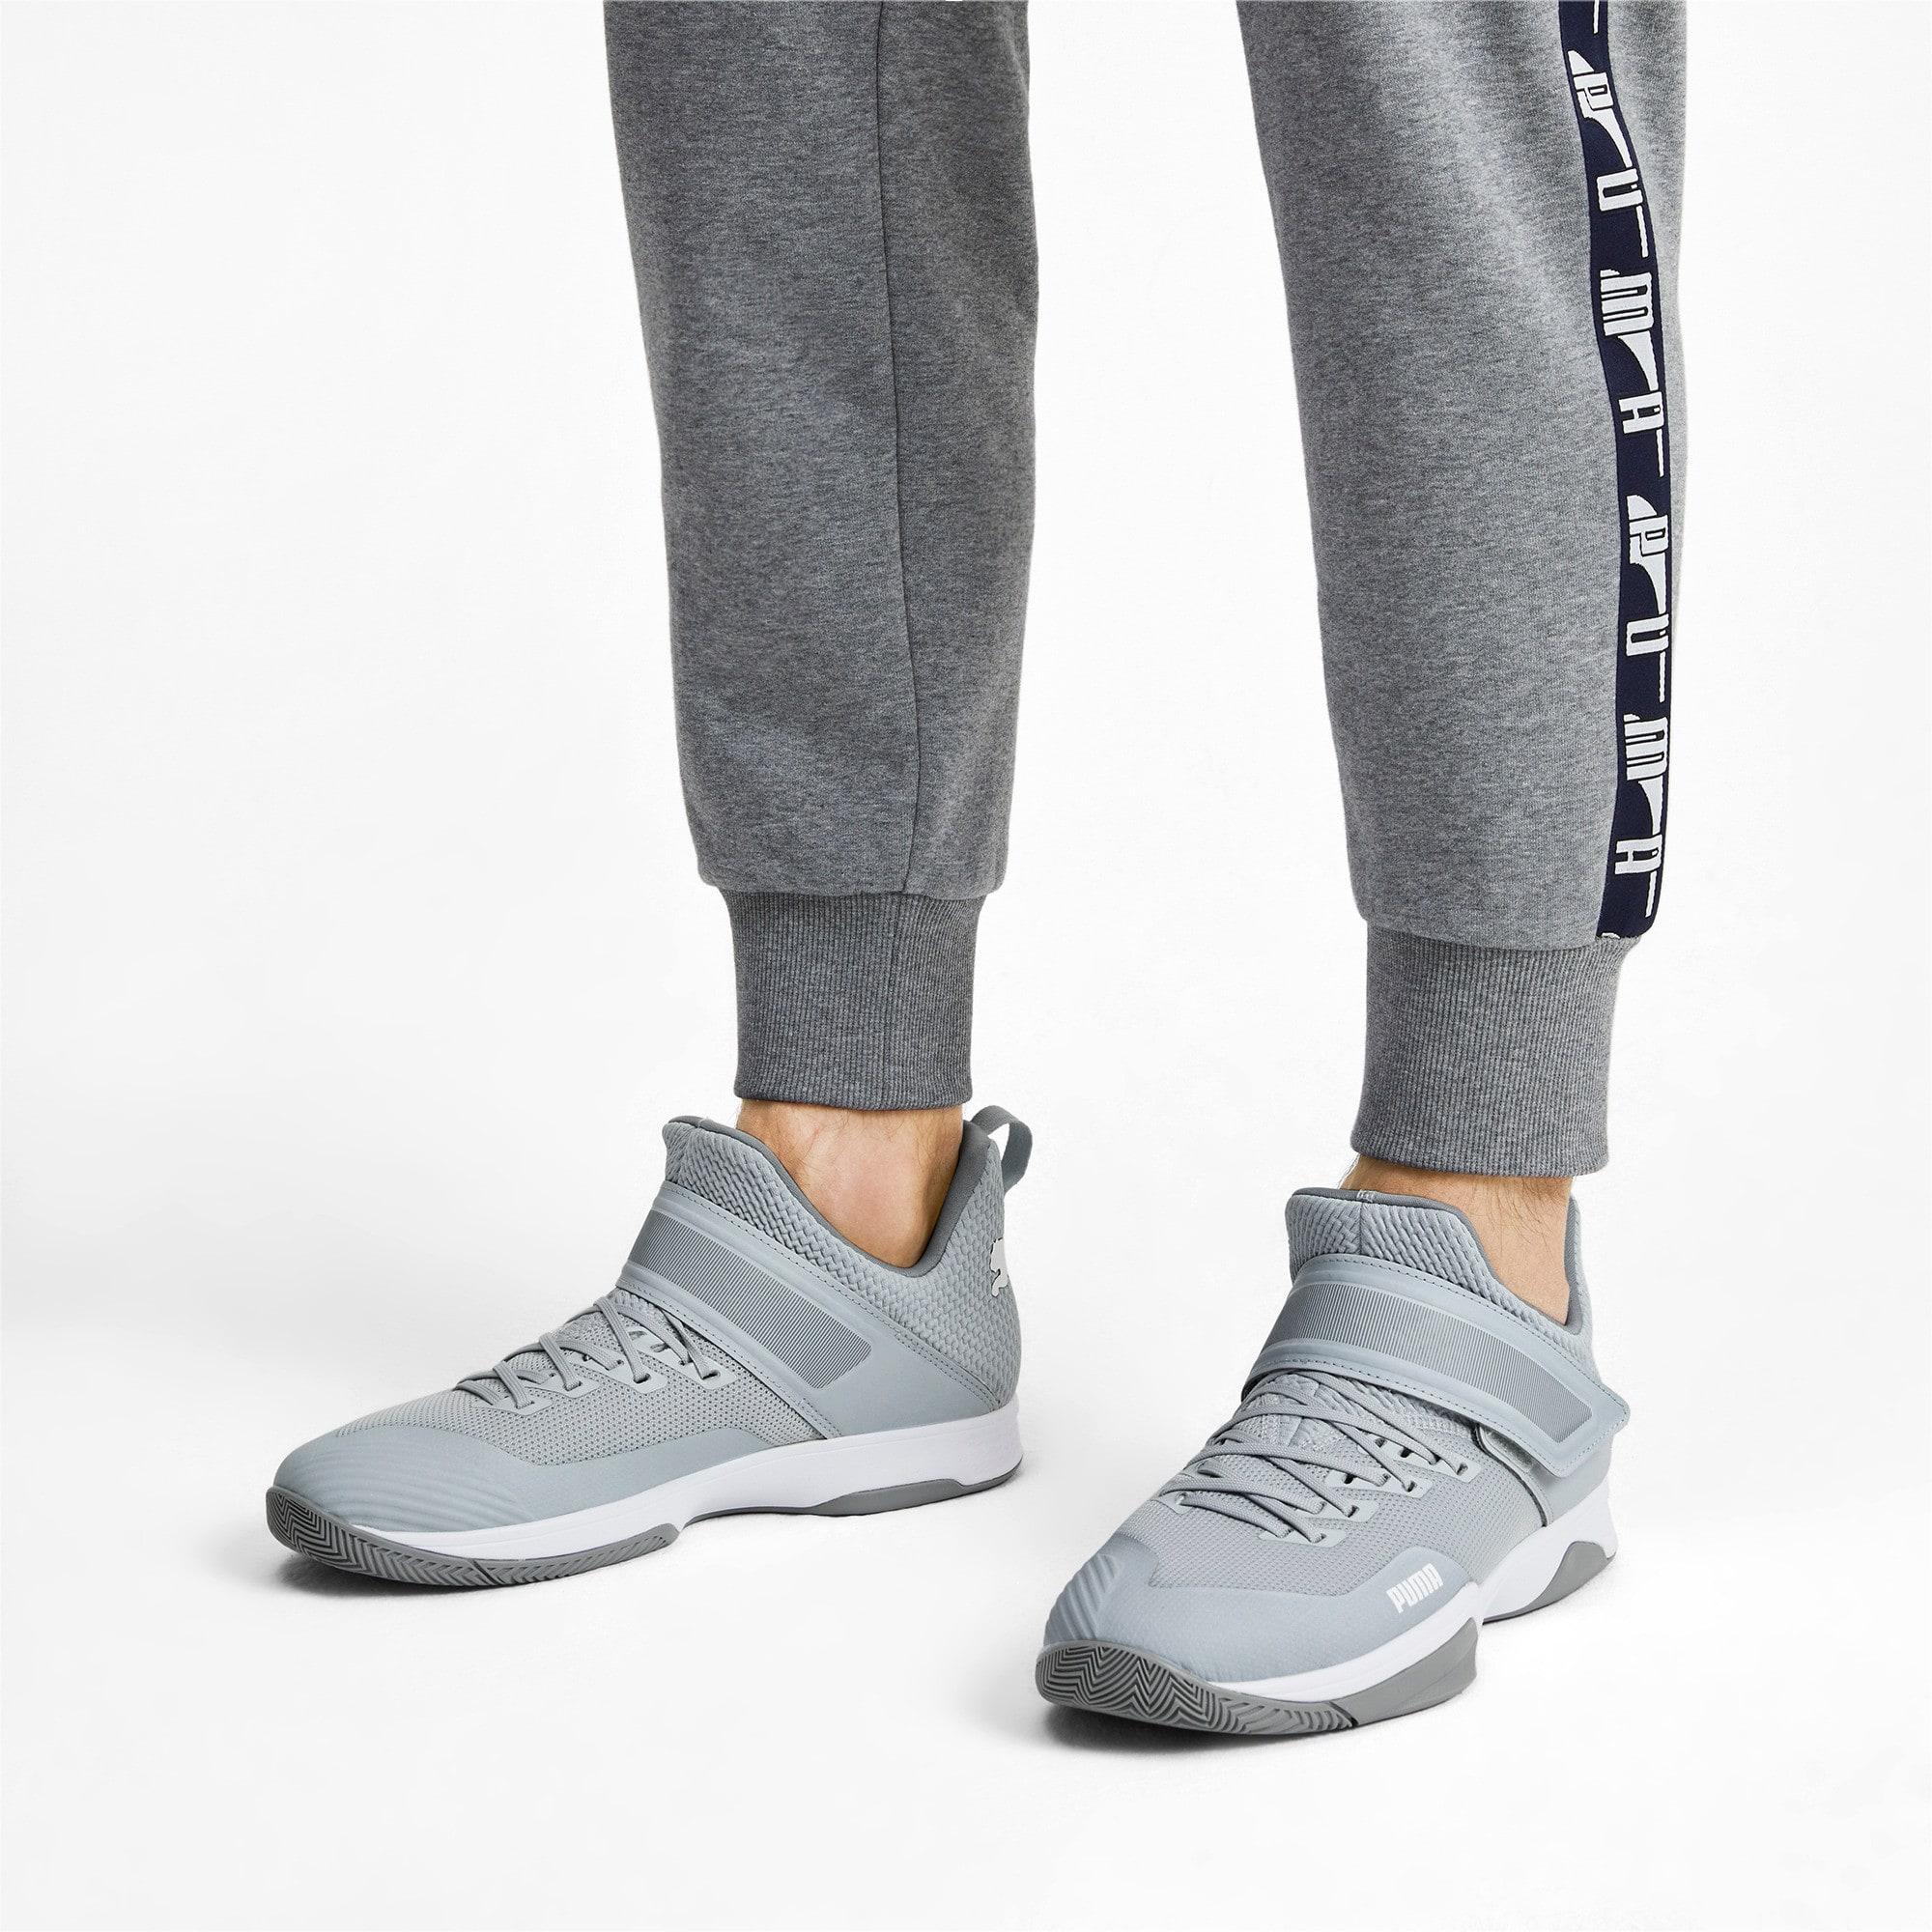 Thumbnail 2 of Rise XT3 Handball Shoes, Grey Dawn-White-Tradewinds, medium-IND